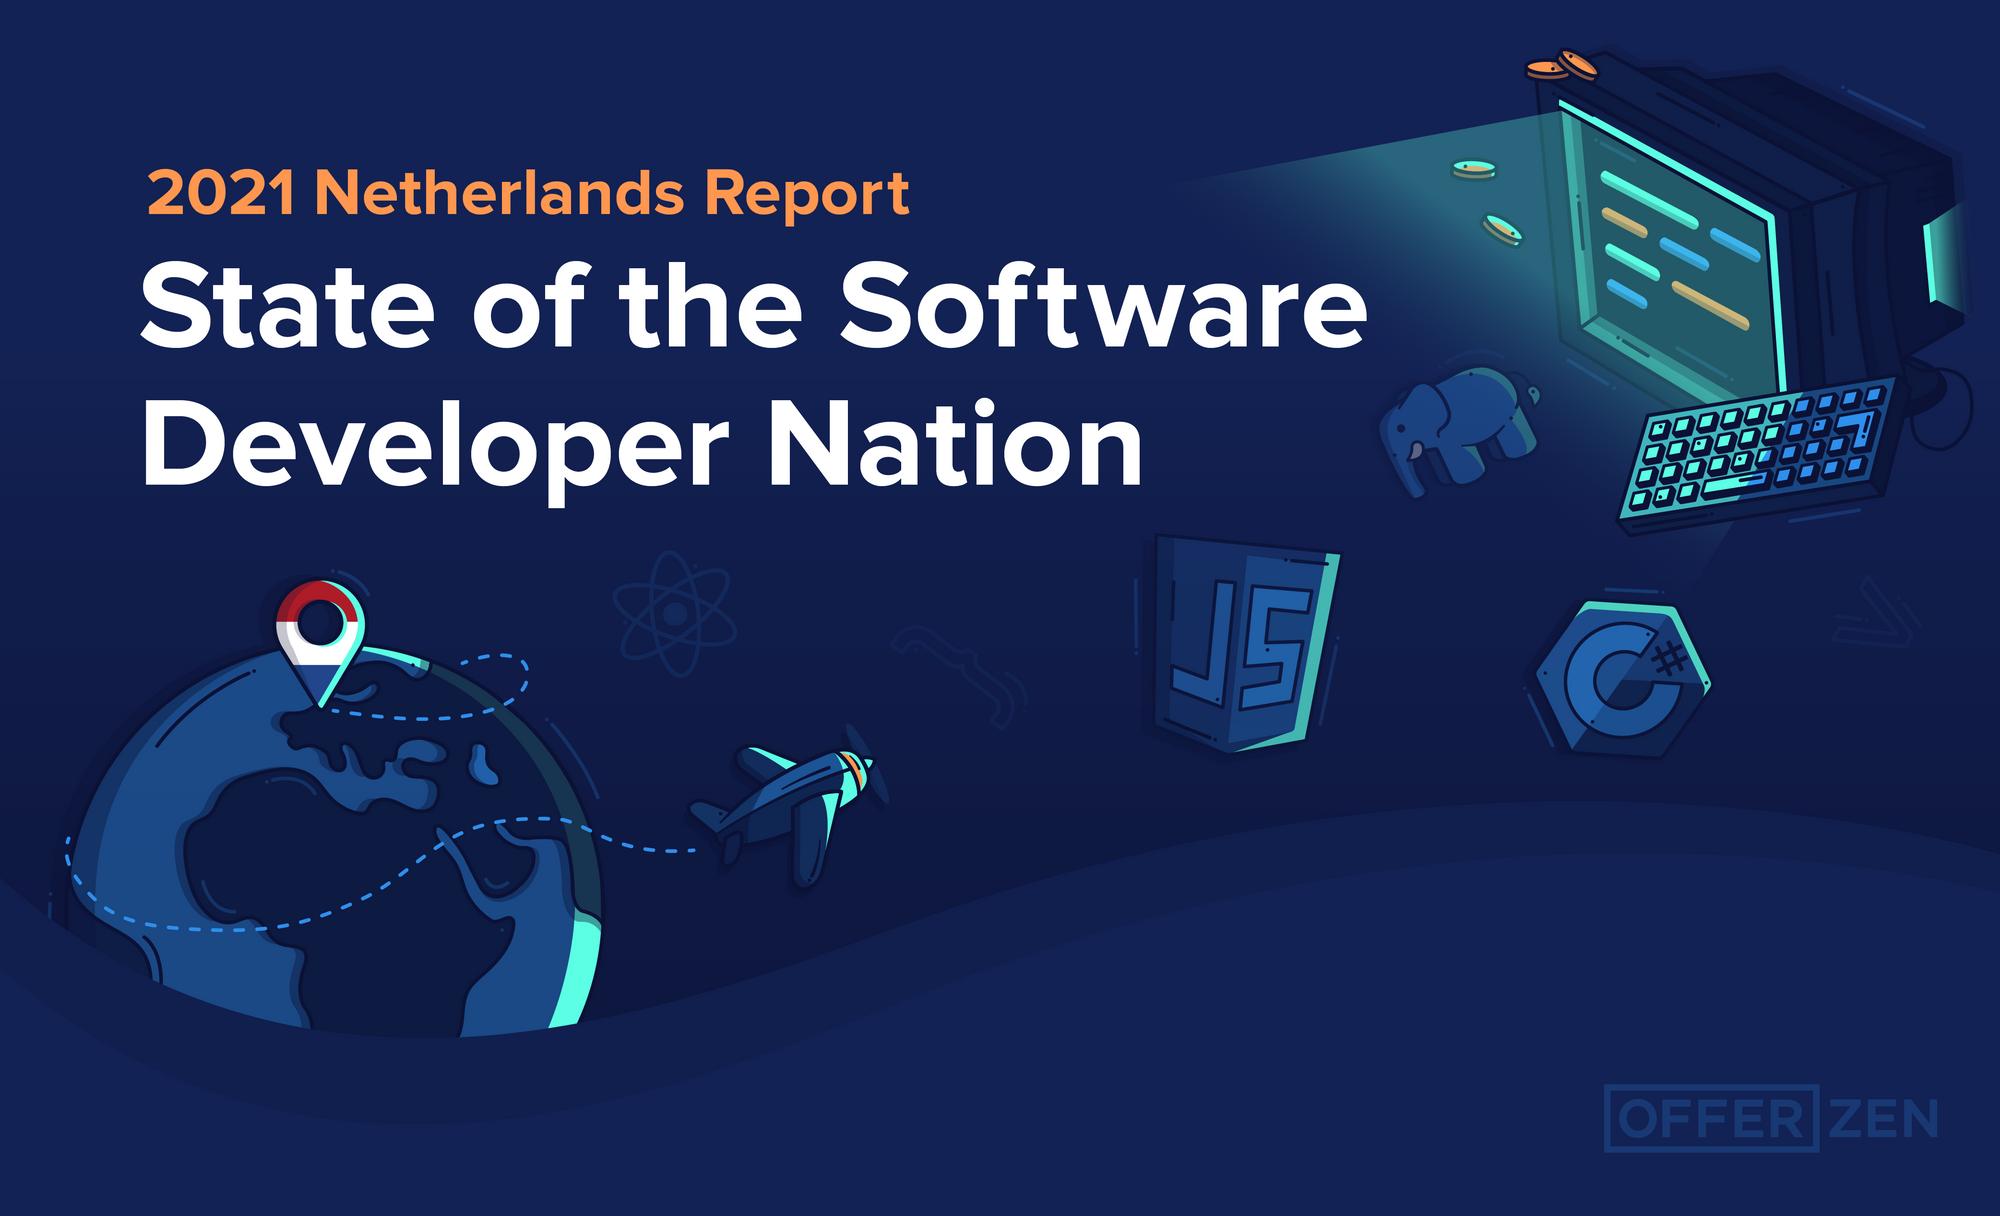 2.OfferZen_2021-State-of-the-Netherlands-Software-Developer-Nation-report_Inner-article-image-1